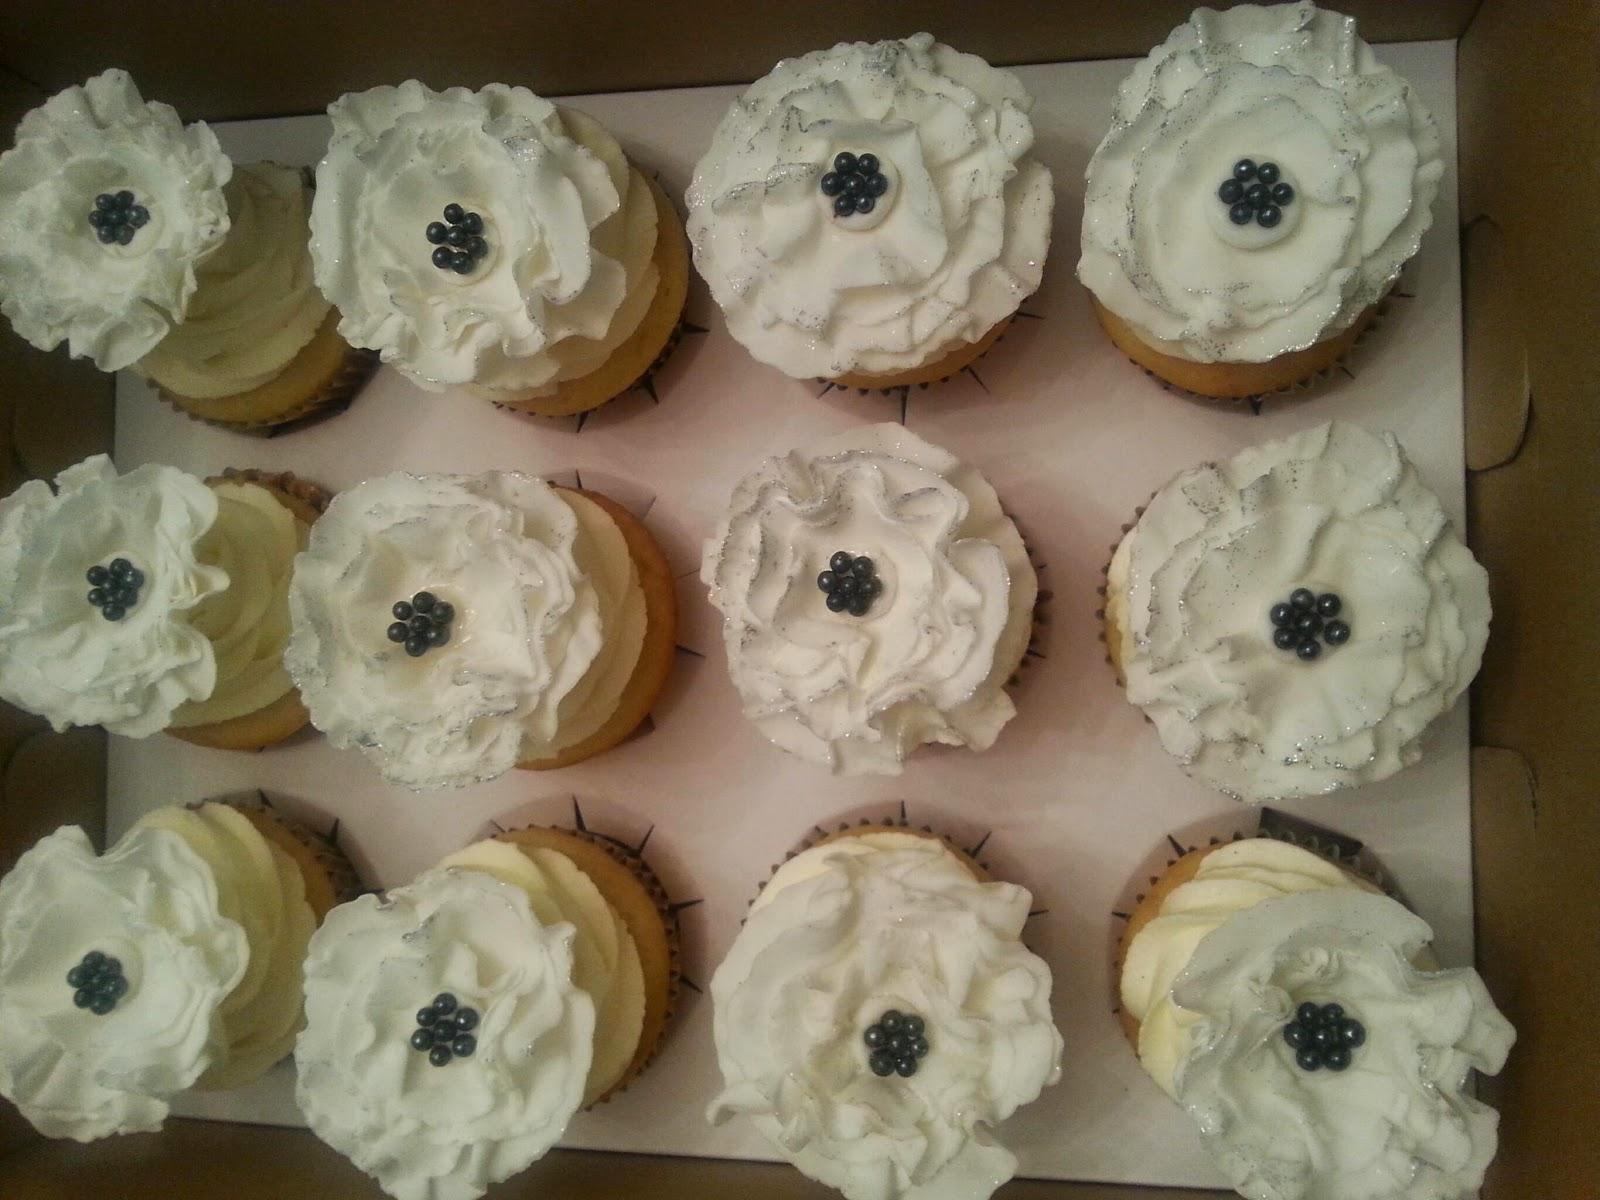 Wedding Dress Cupcake Cake 22 Epic Wedding Dress Cake and